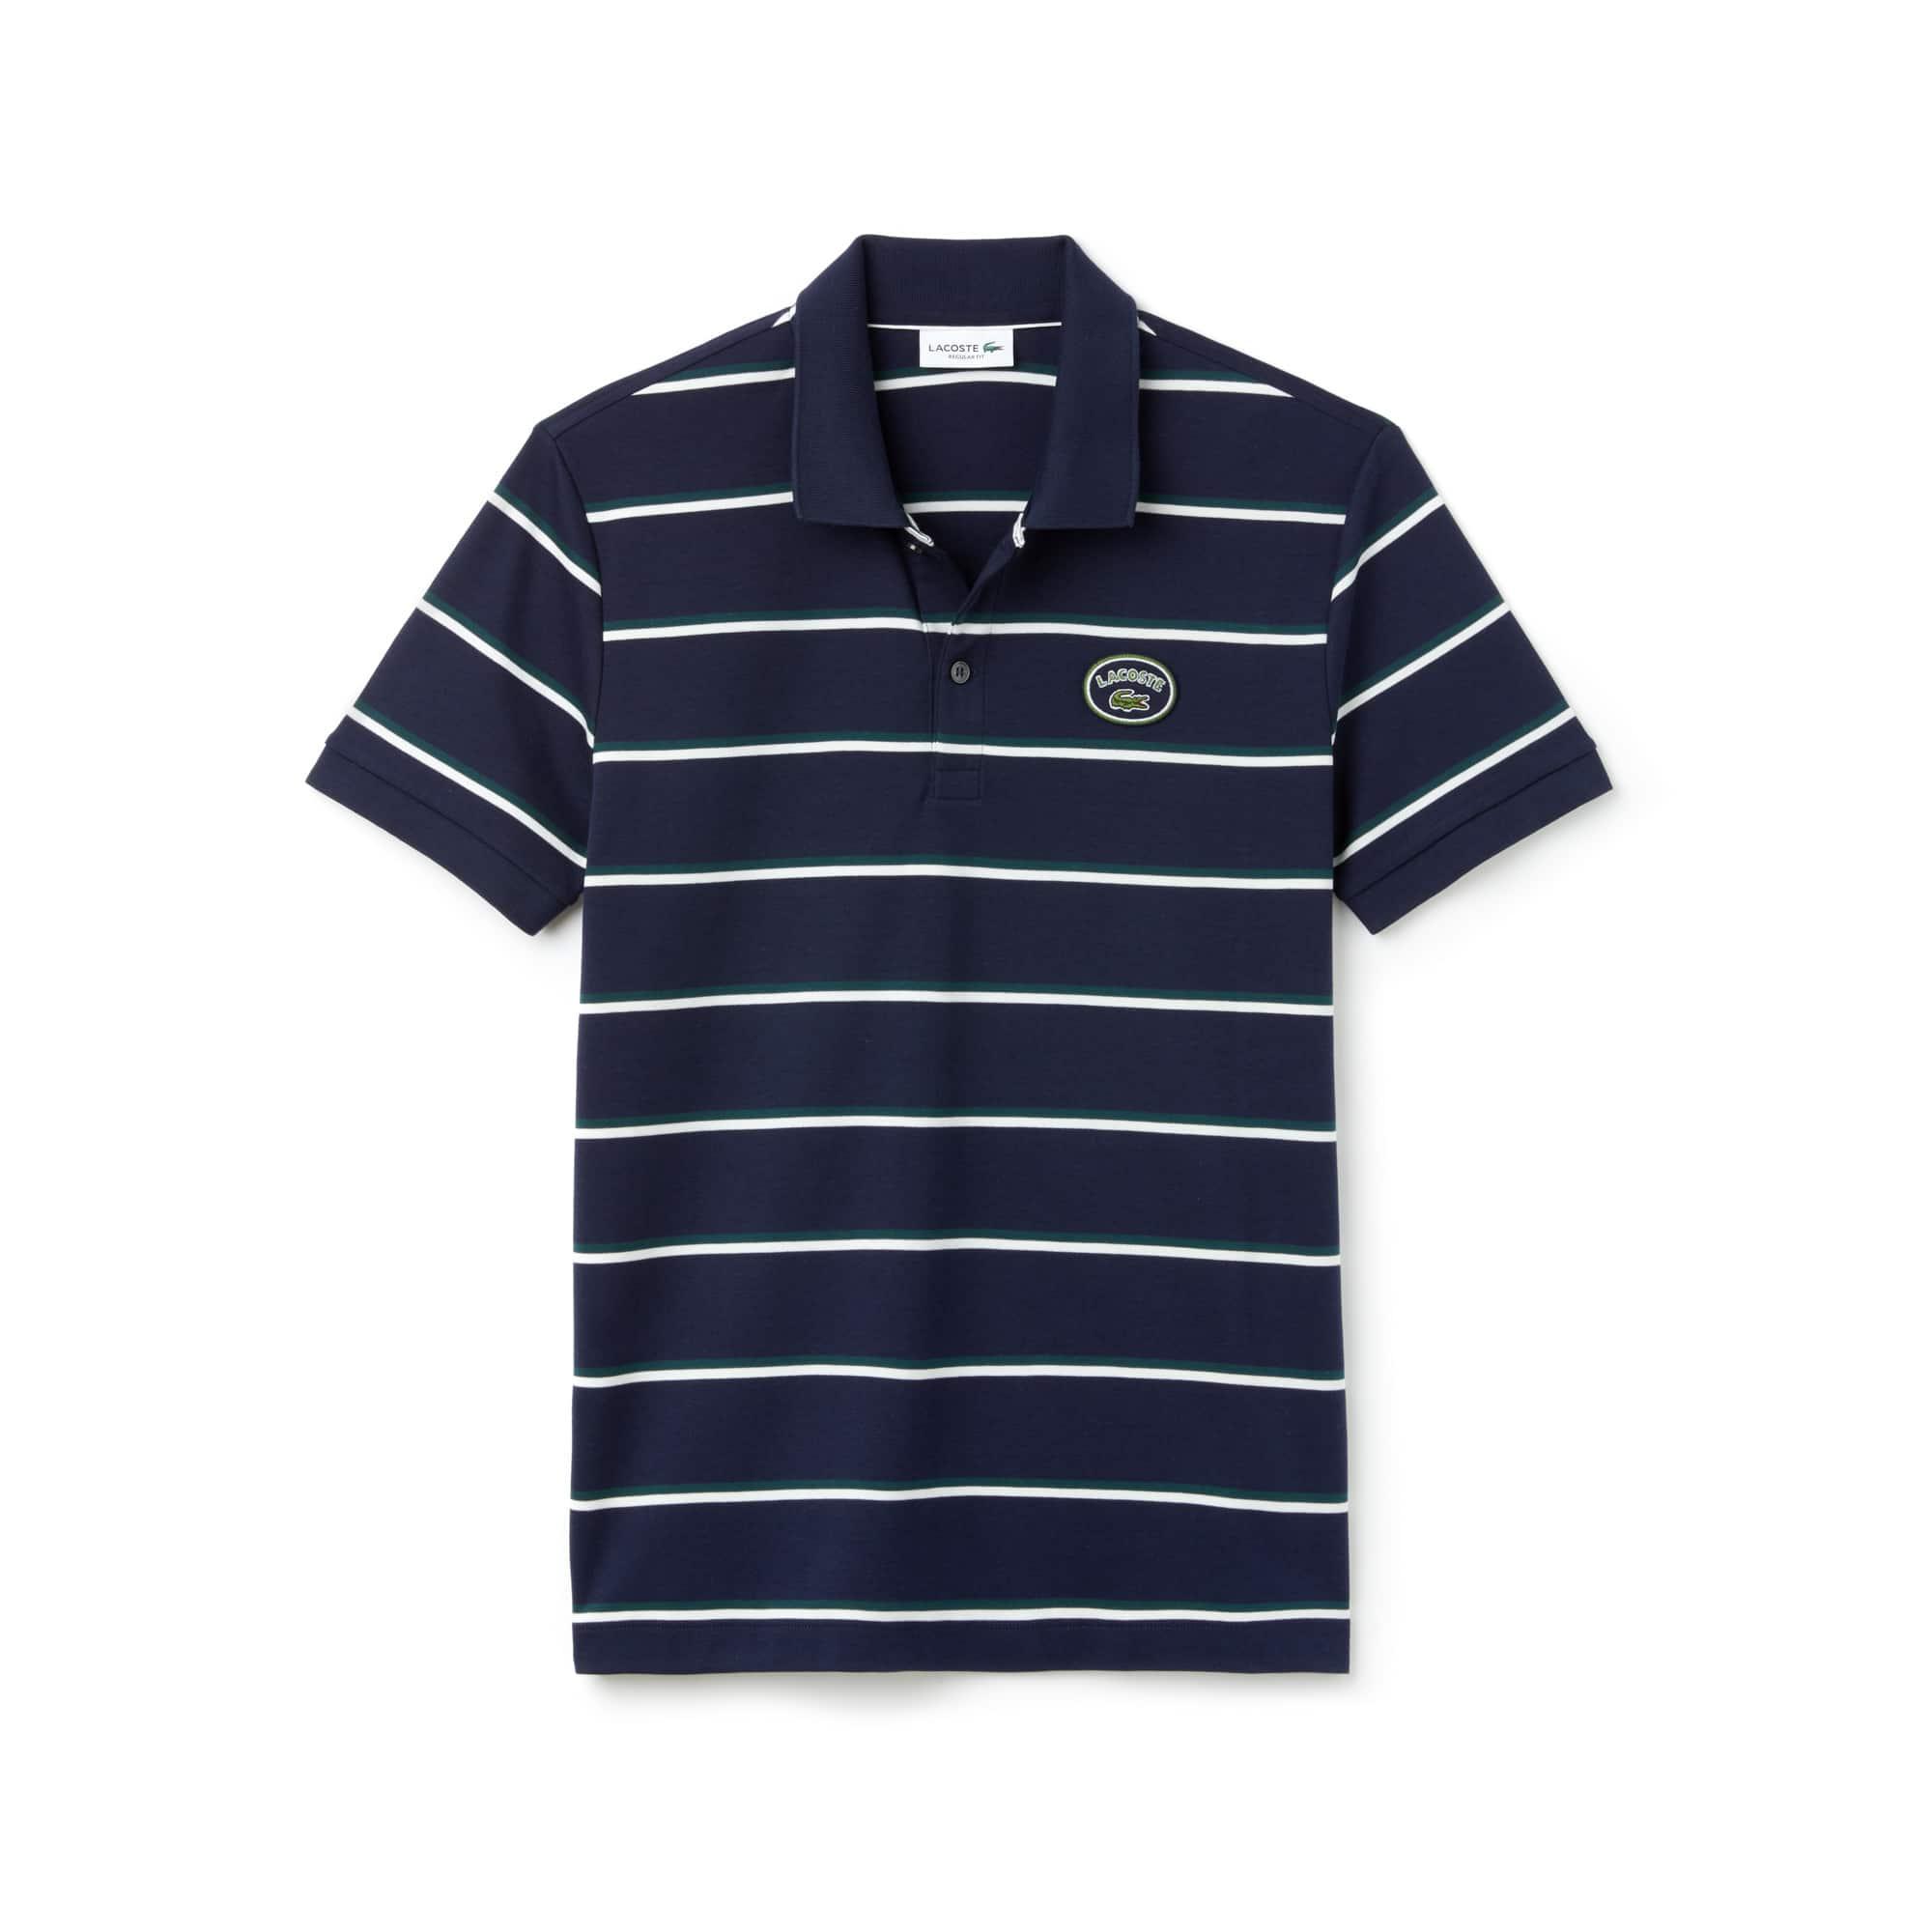 Men's Lacoste Regular Fit Striped Cotton Interlock Polo Shirt